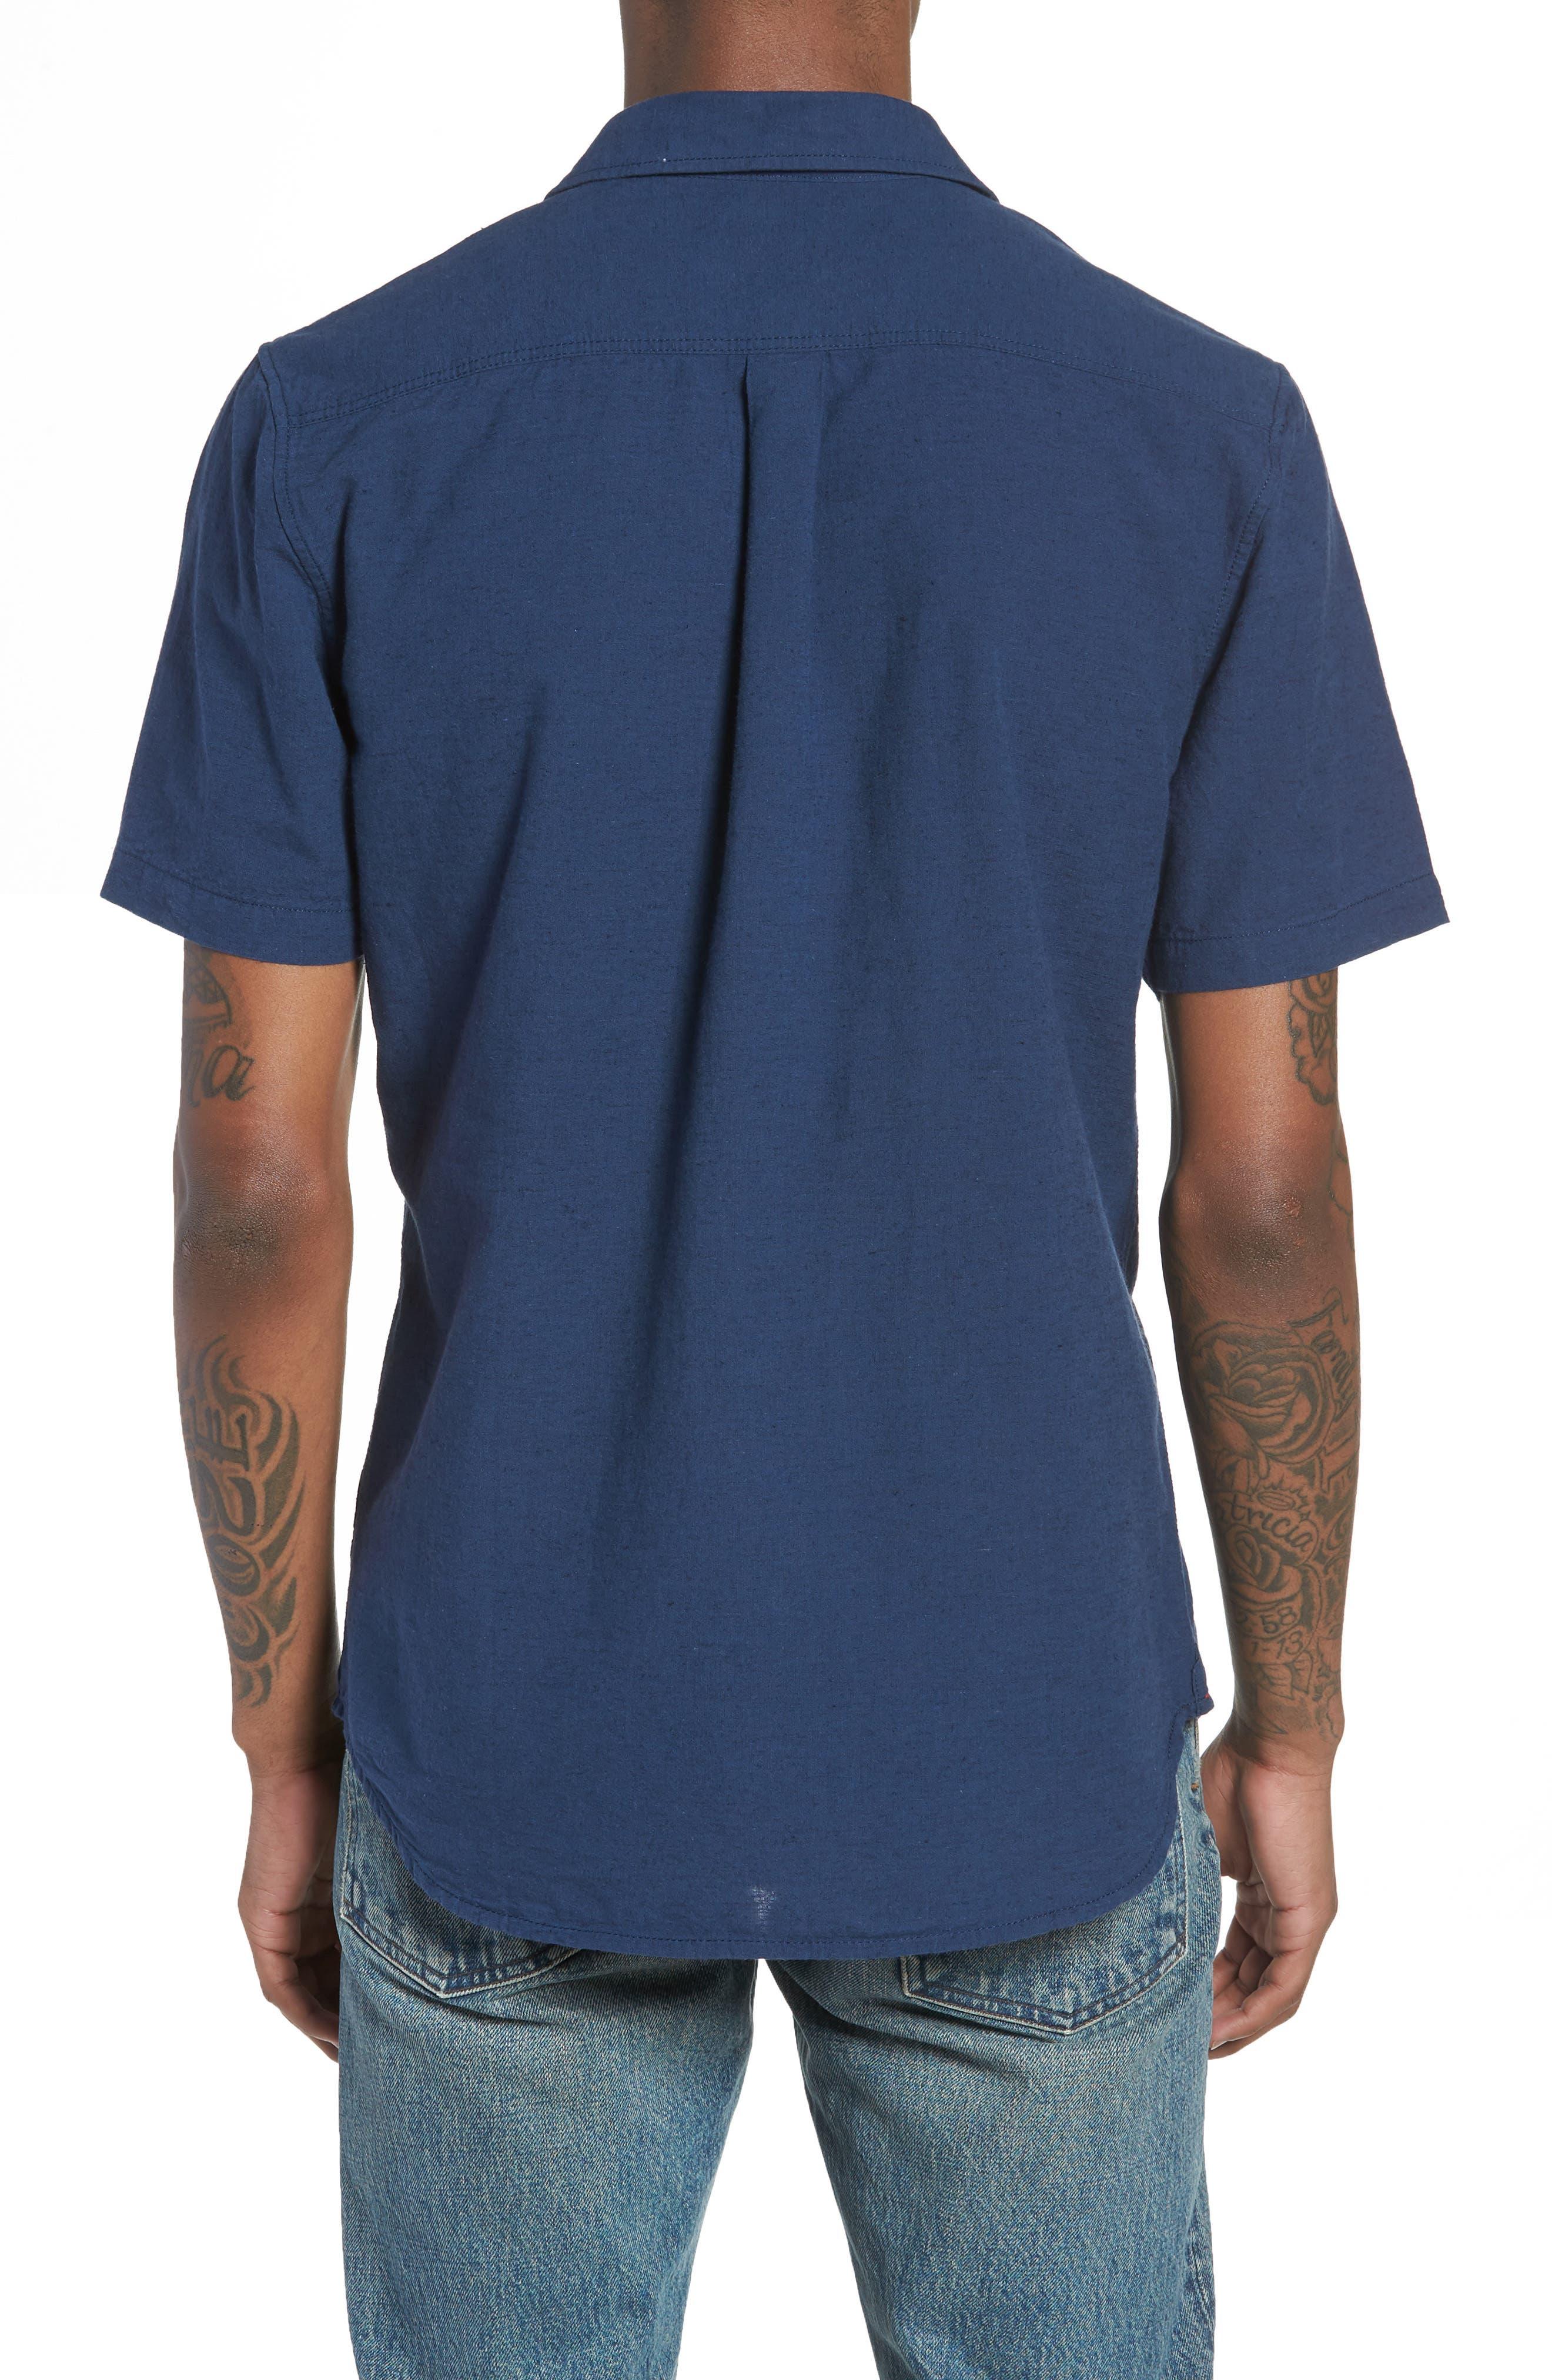 Thurber Short Sleeve Shirt,                             Alternate thumbnail 2, color,                             401